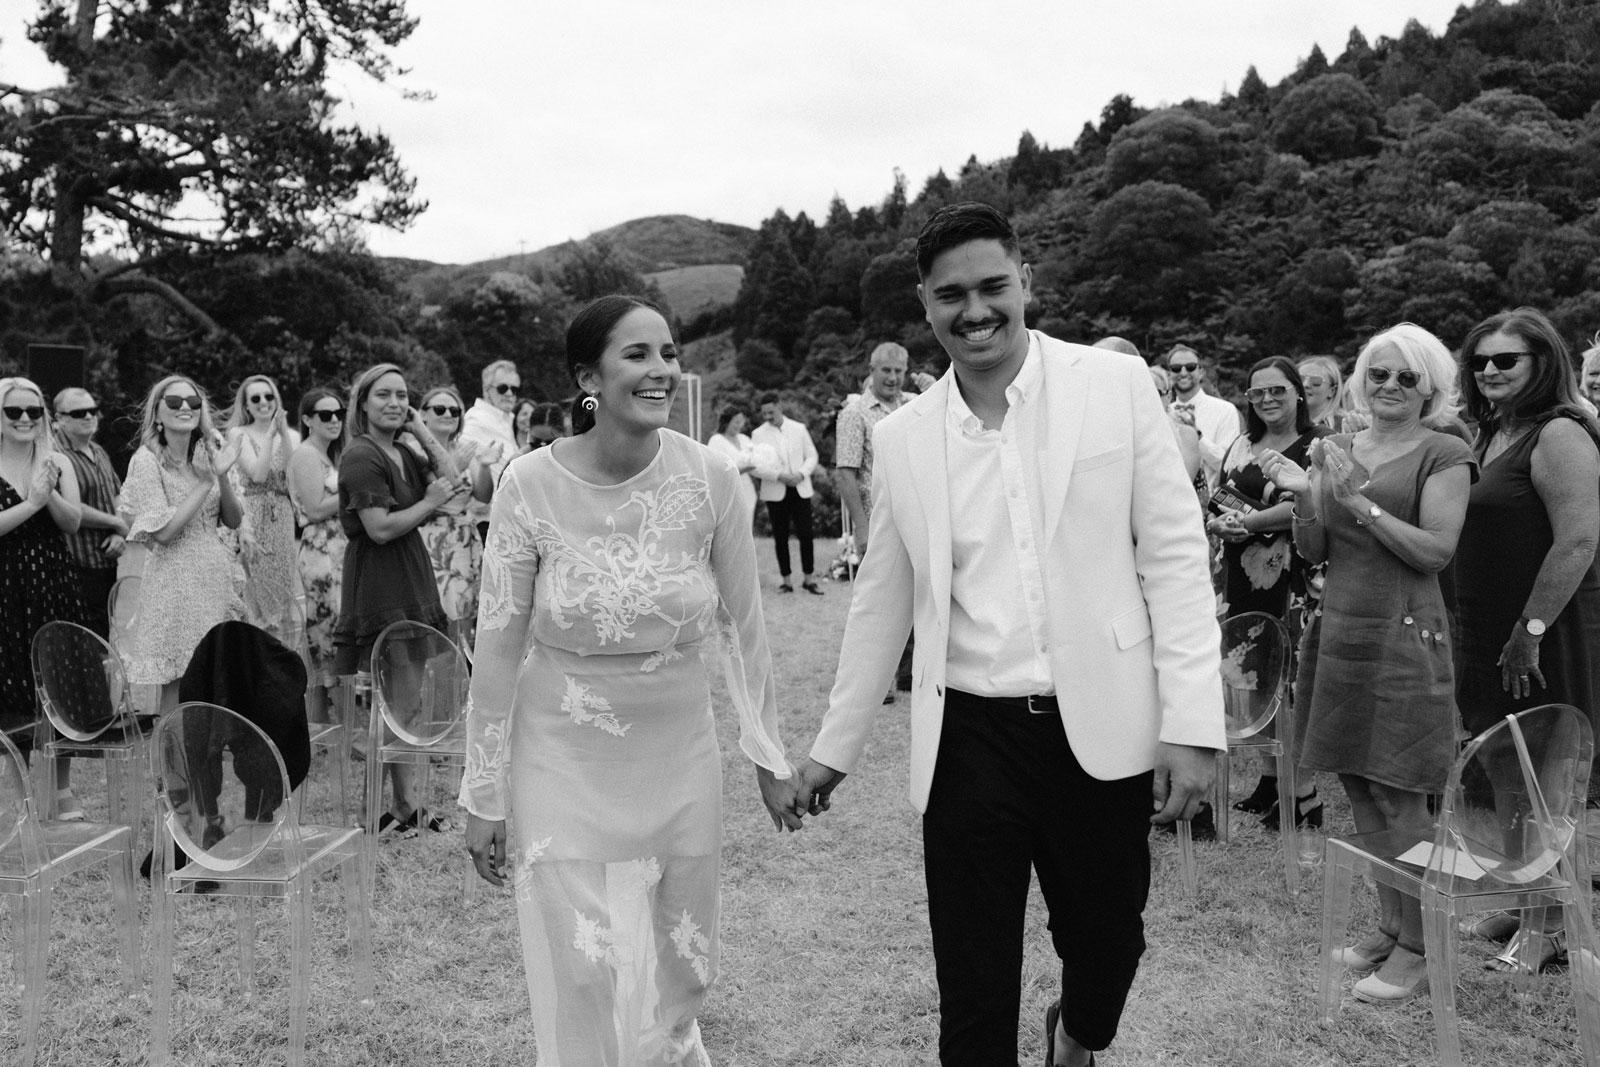 newfound-s-t-hunua-auckland-wedding-photographers-042